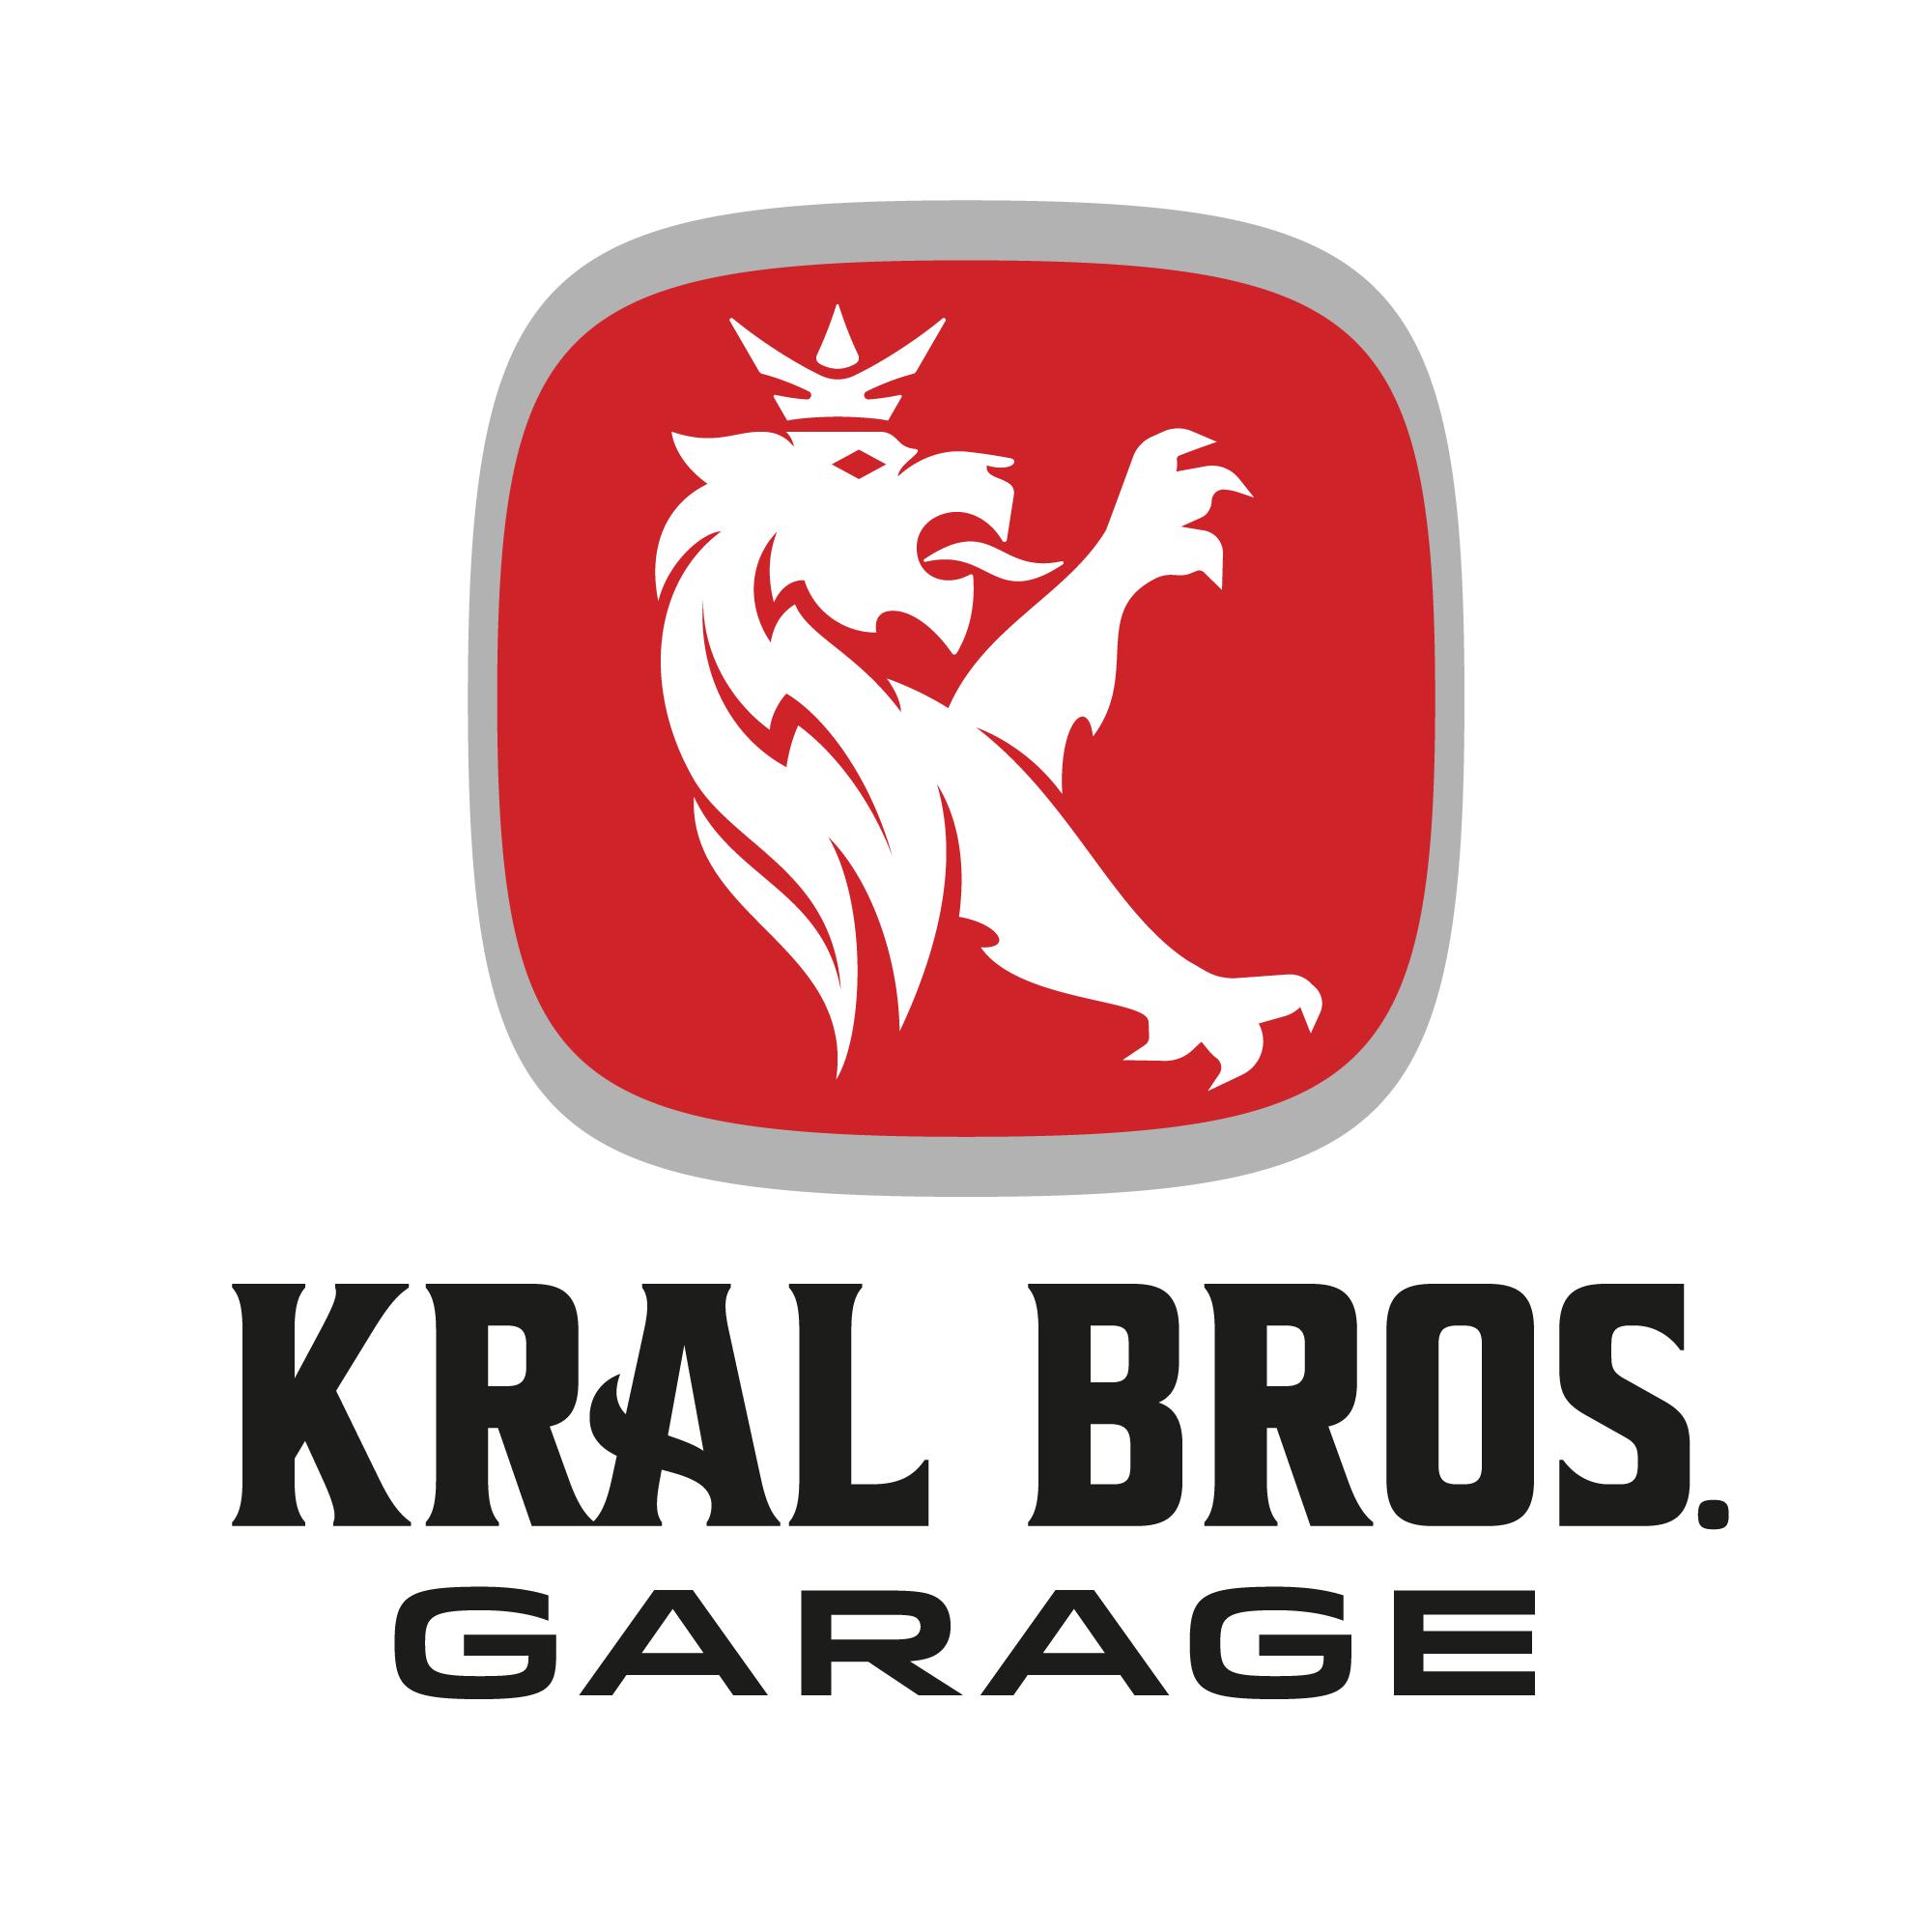 kral bro logo